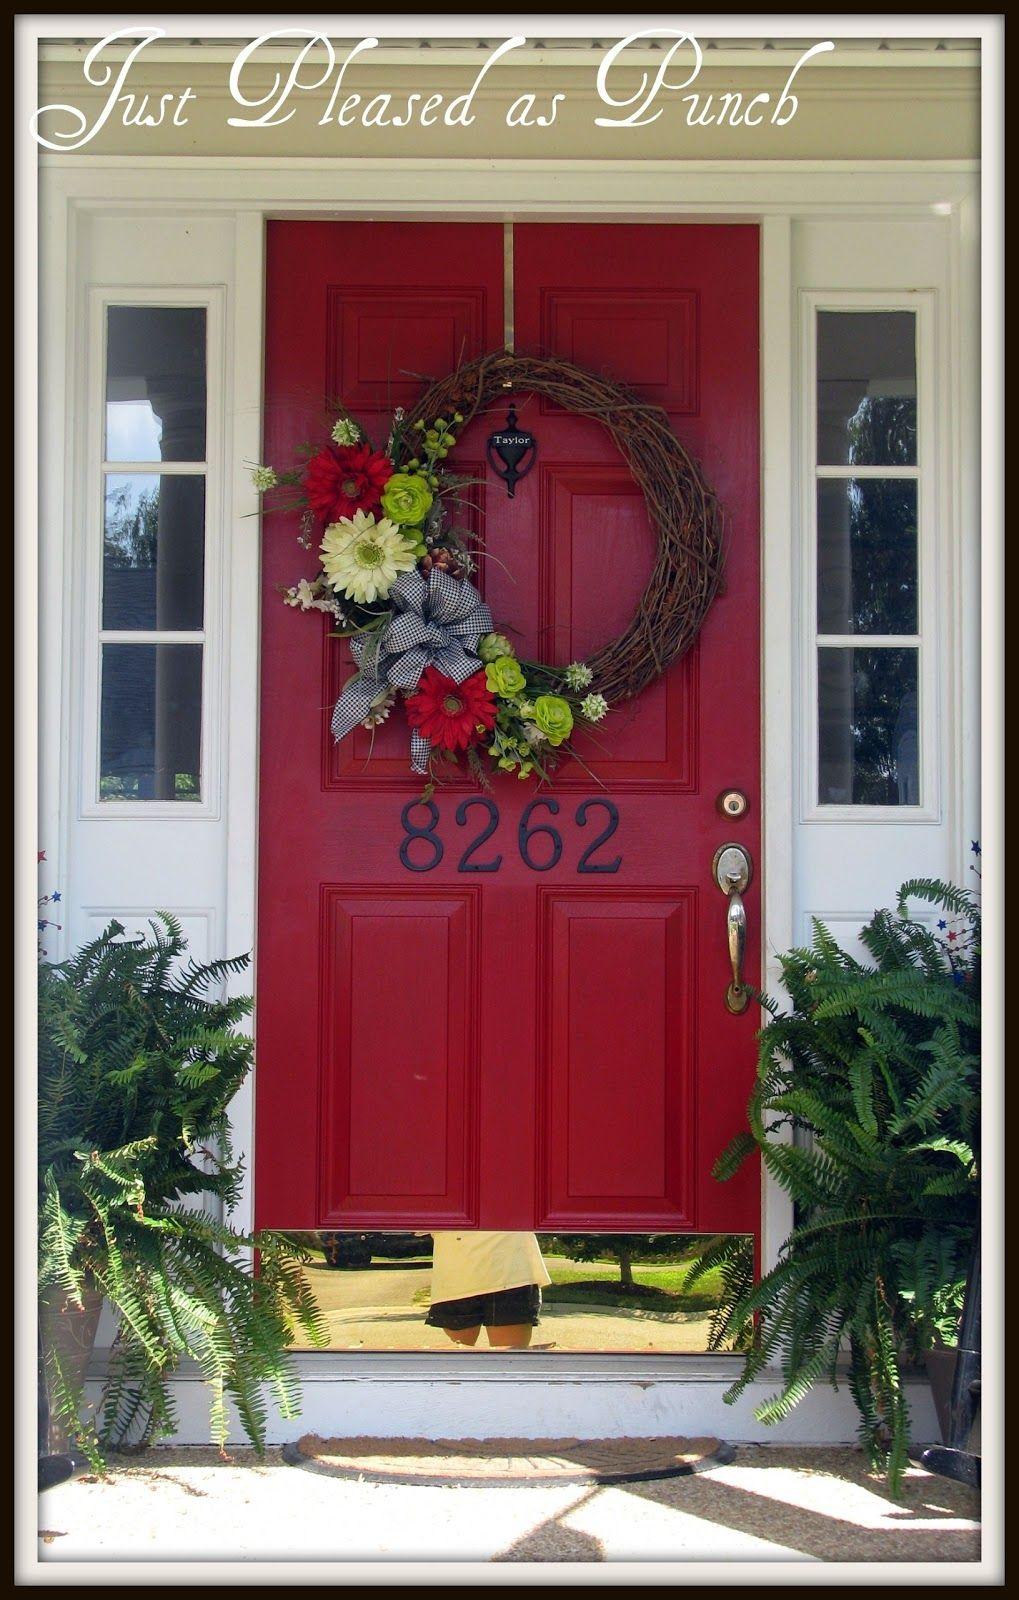 Update The Mailbox Vinyl Door Knocker And Rocking Chair